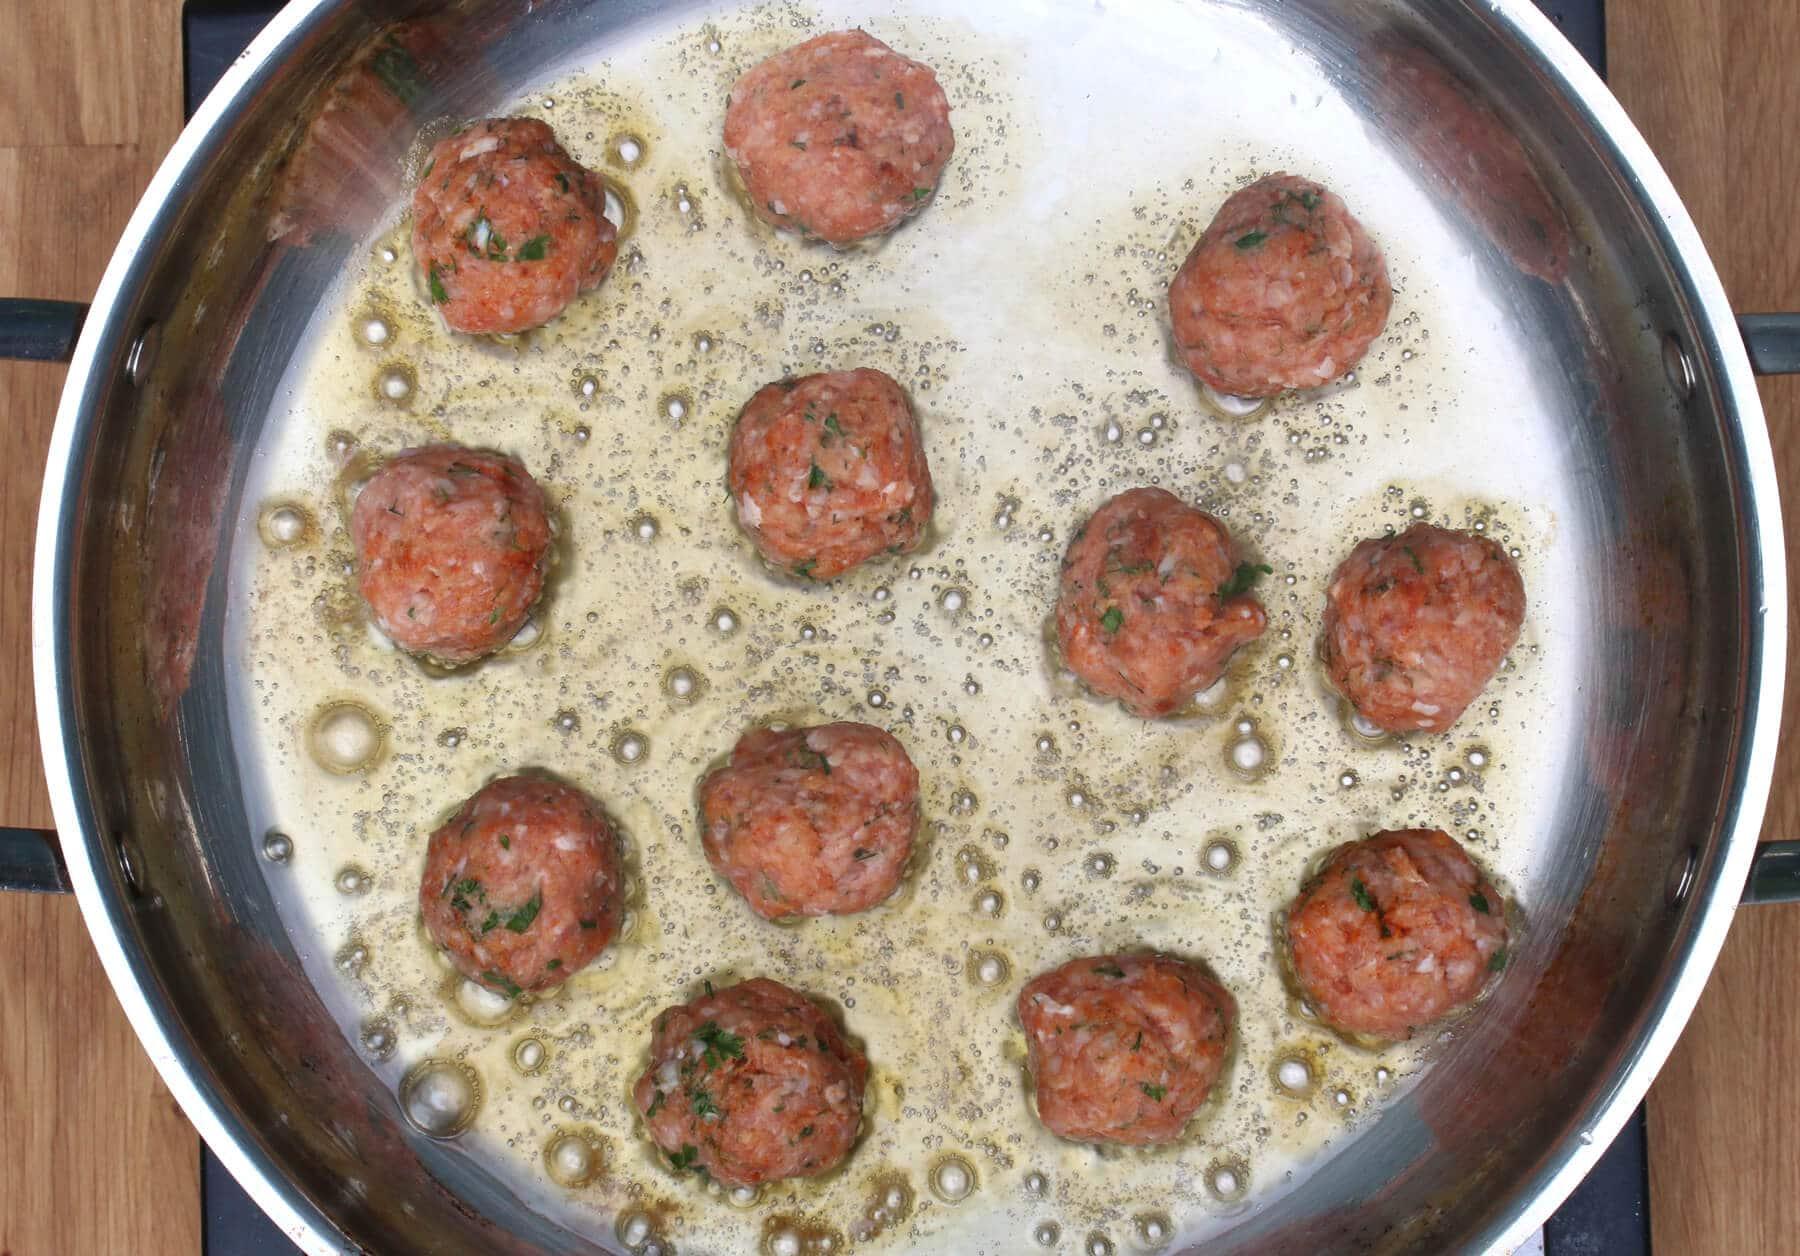 hungarian-meatballs-new-prep-4